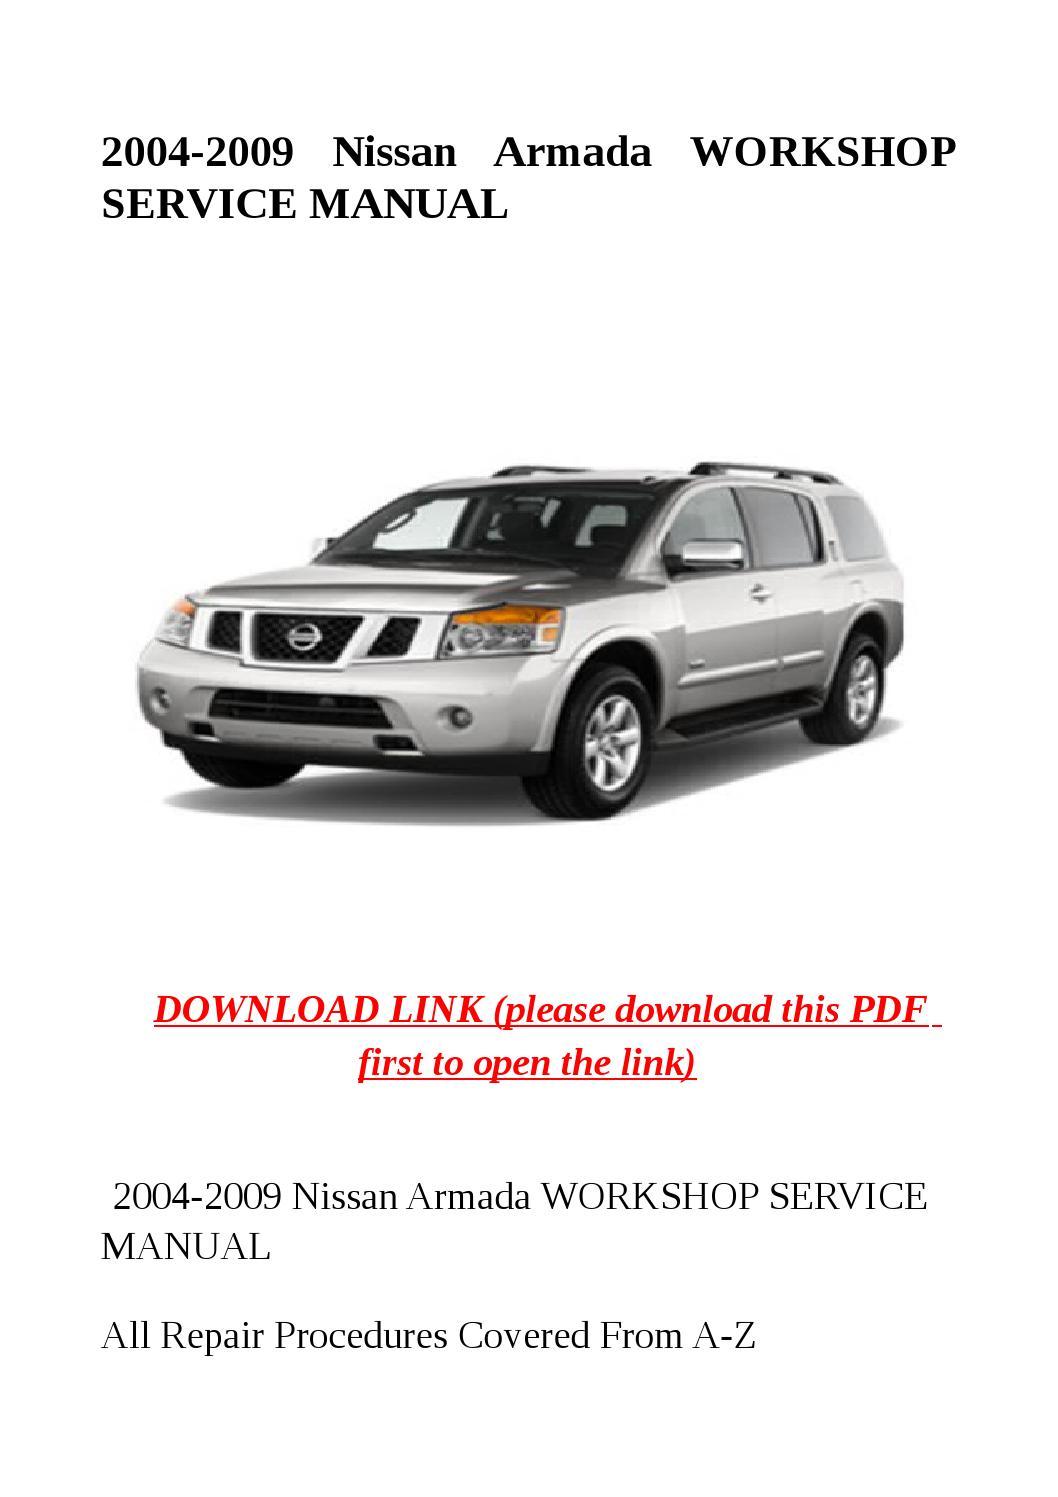 2004 2009 Nissan Armada Workshop Service Manual By Sally Mool